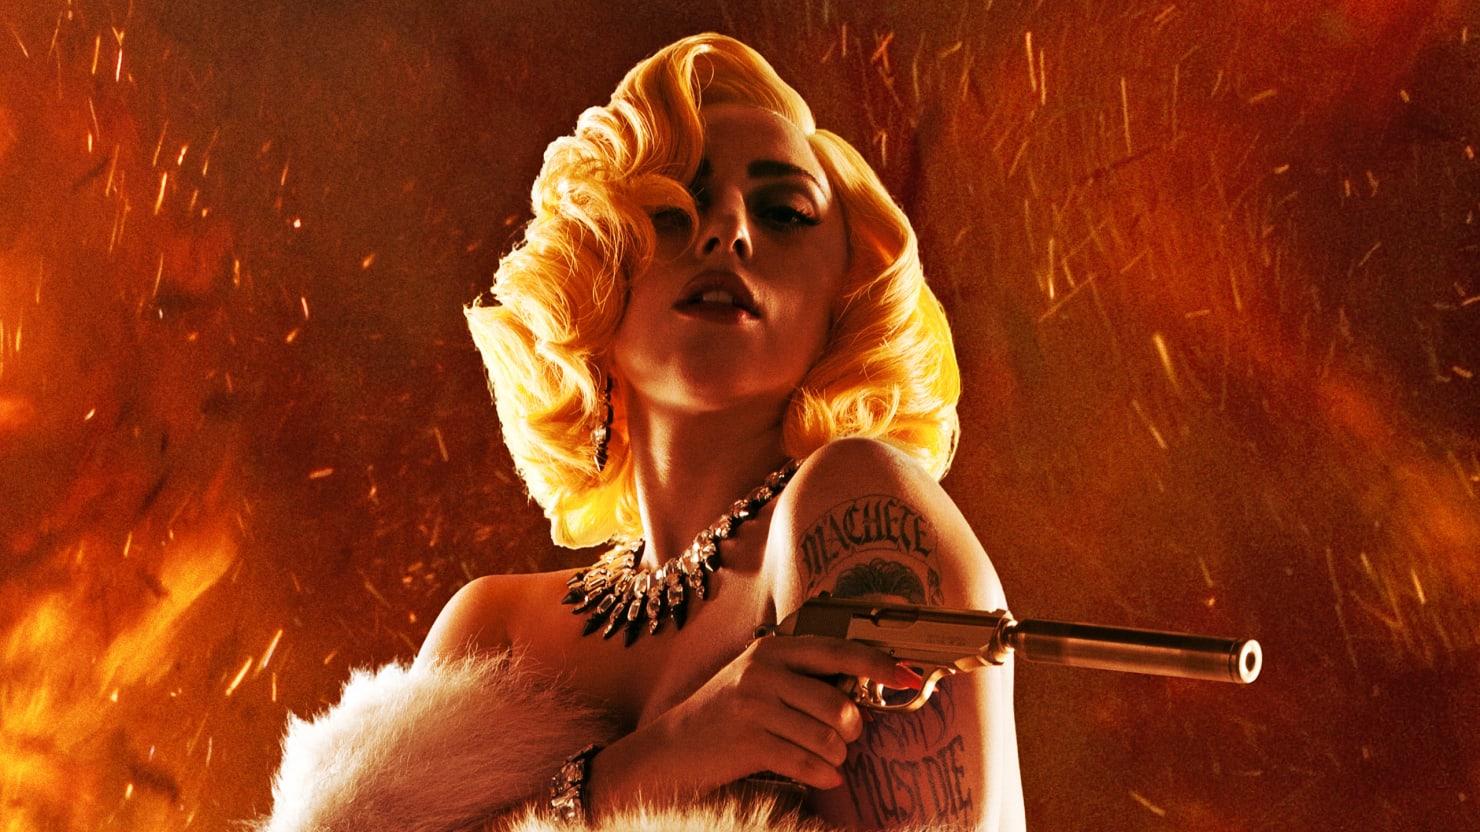 Lady Gaga's Kick-Ass Movie Debut As A Sexy Assassin In 'Machete Kills'